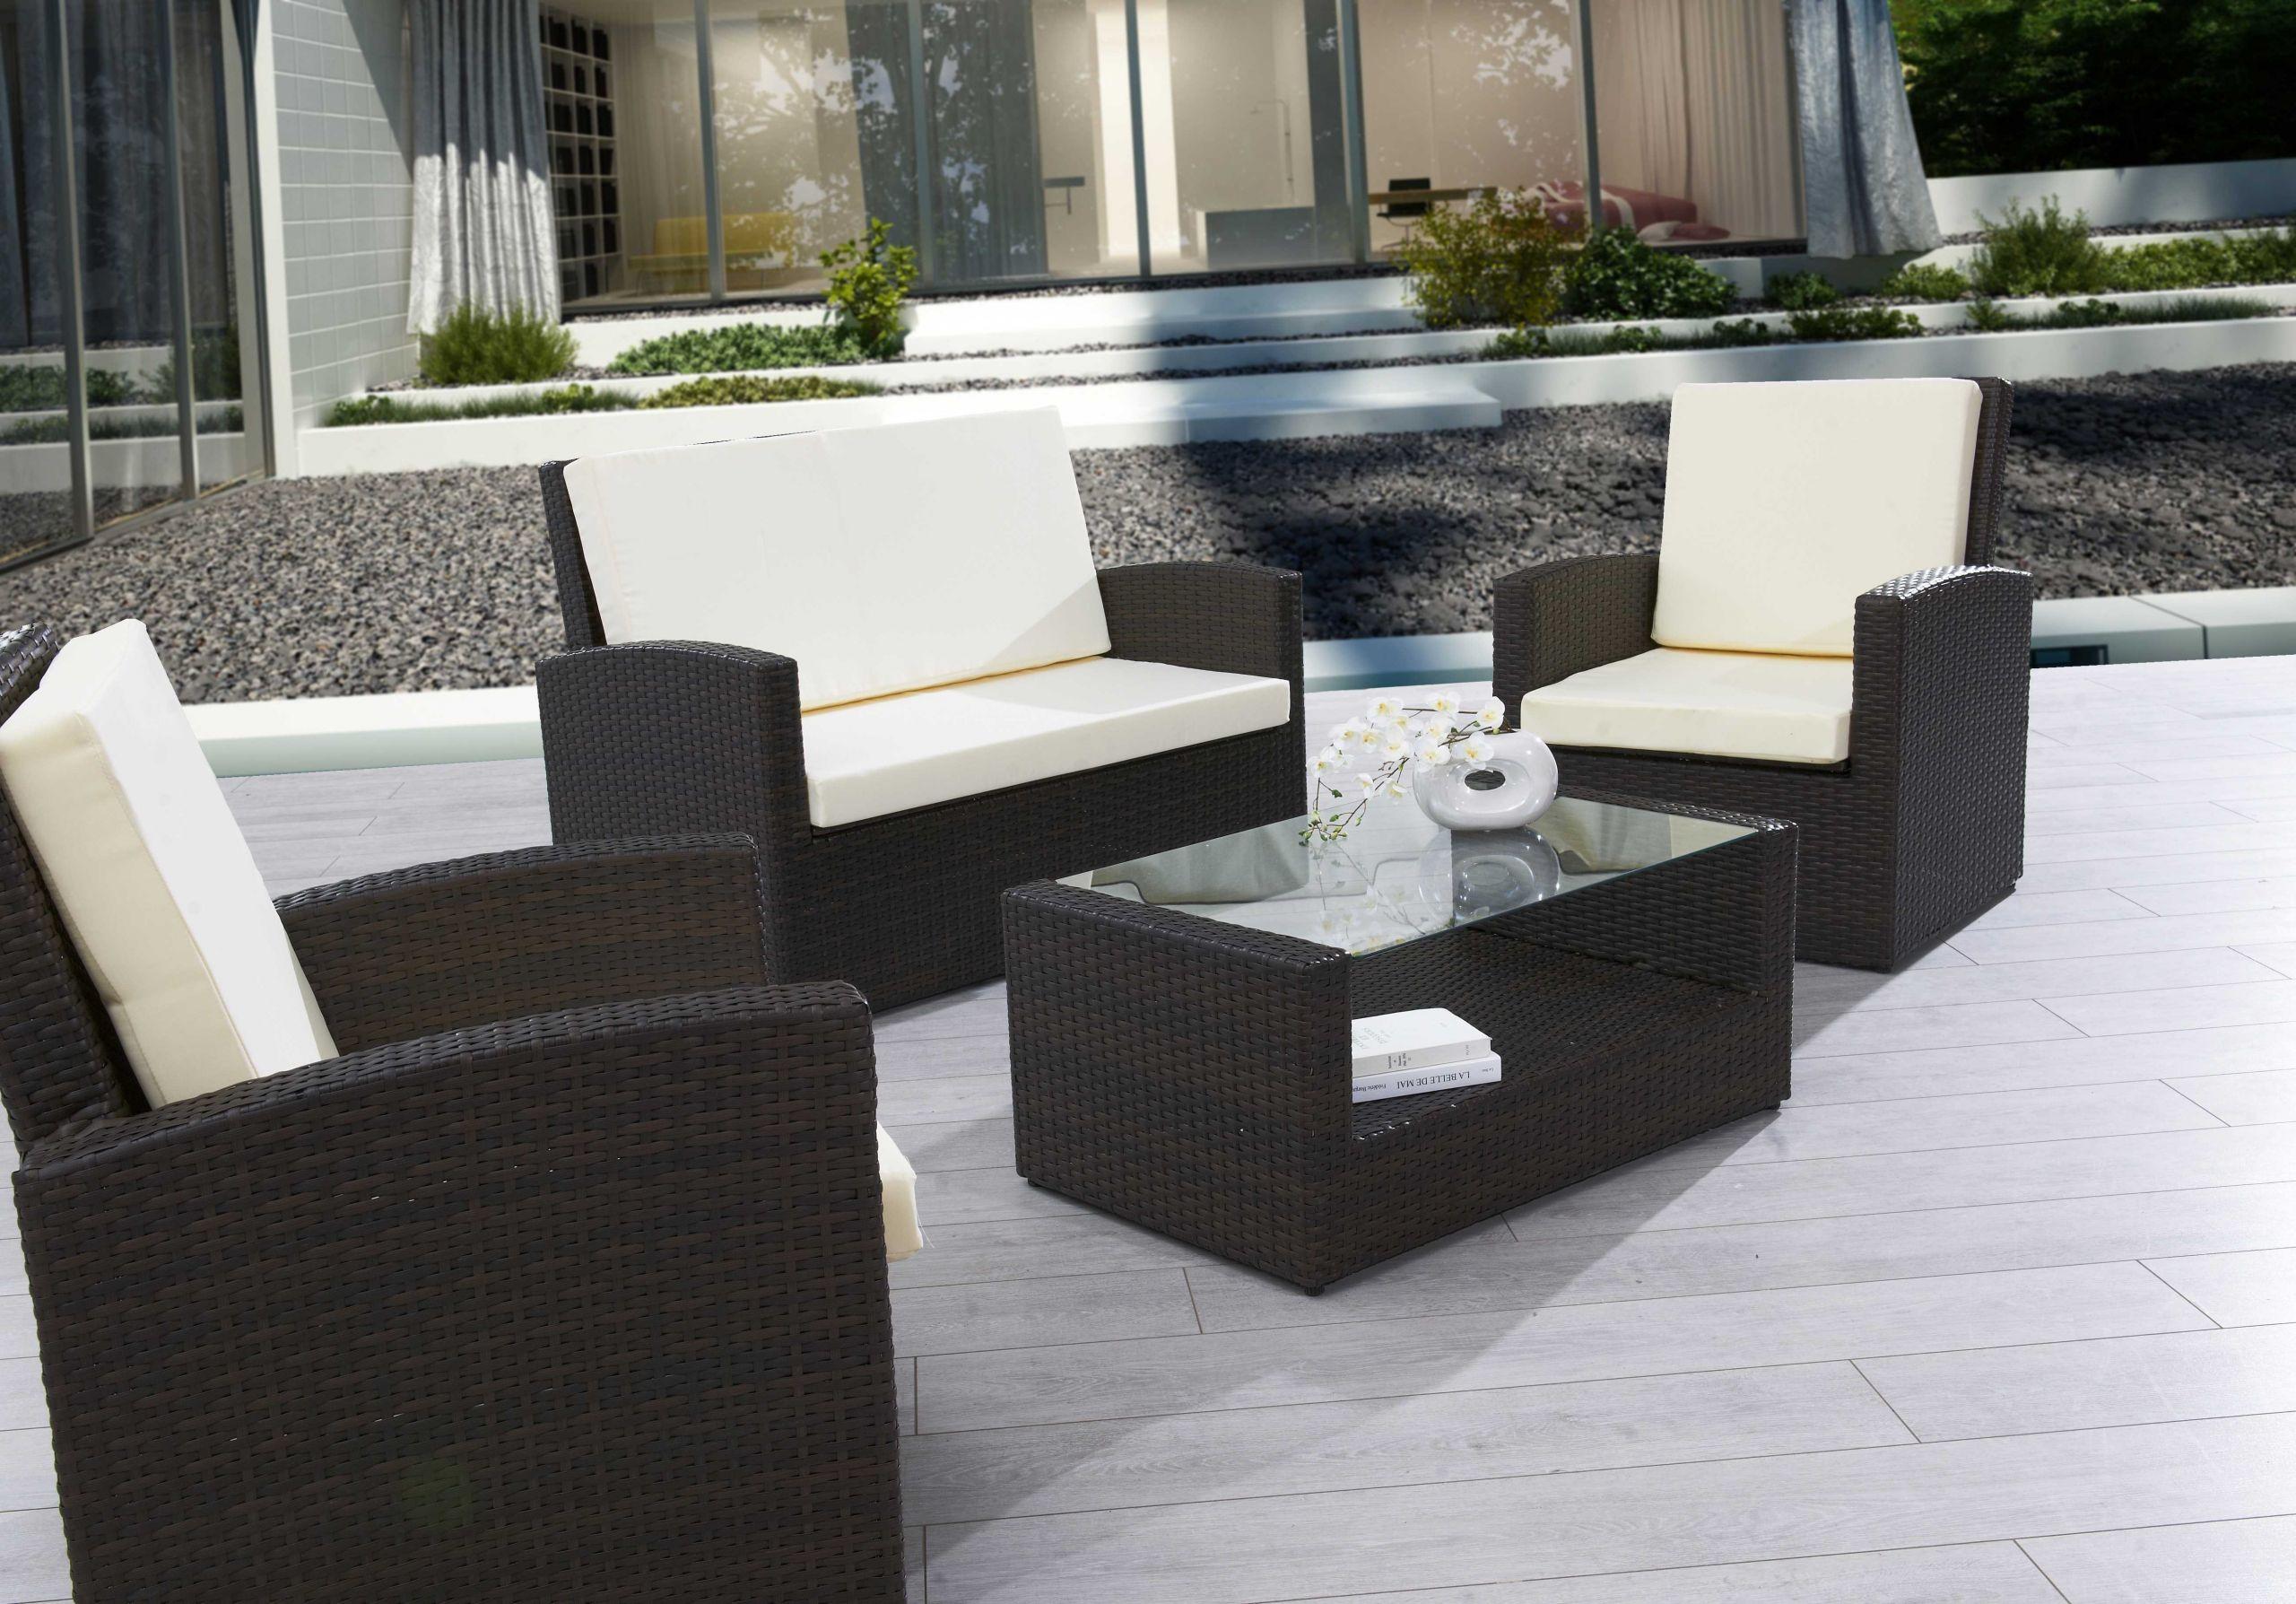 salon de jardin pour balcon luxe table et chaise pour terrasse pas cher de salon de jardin pour balcon scaled